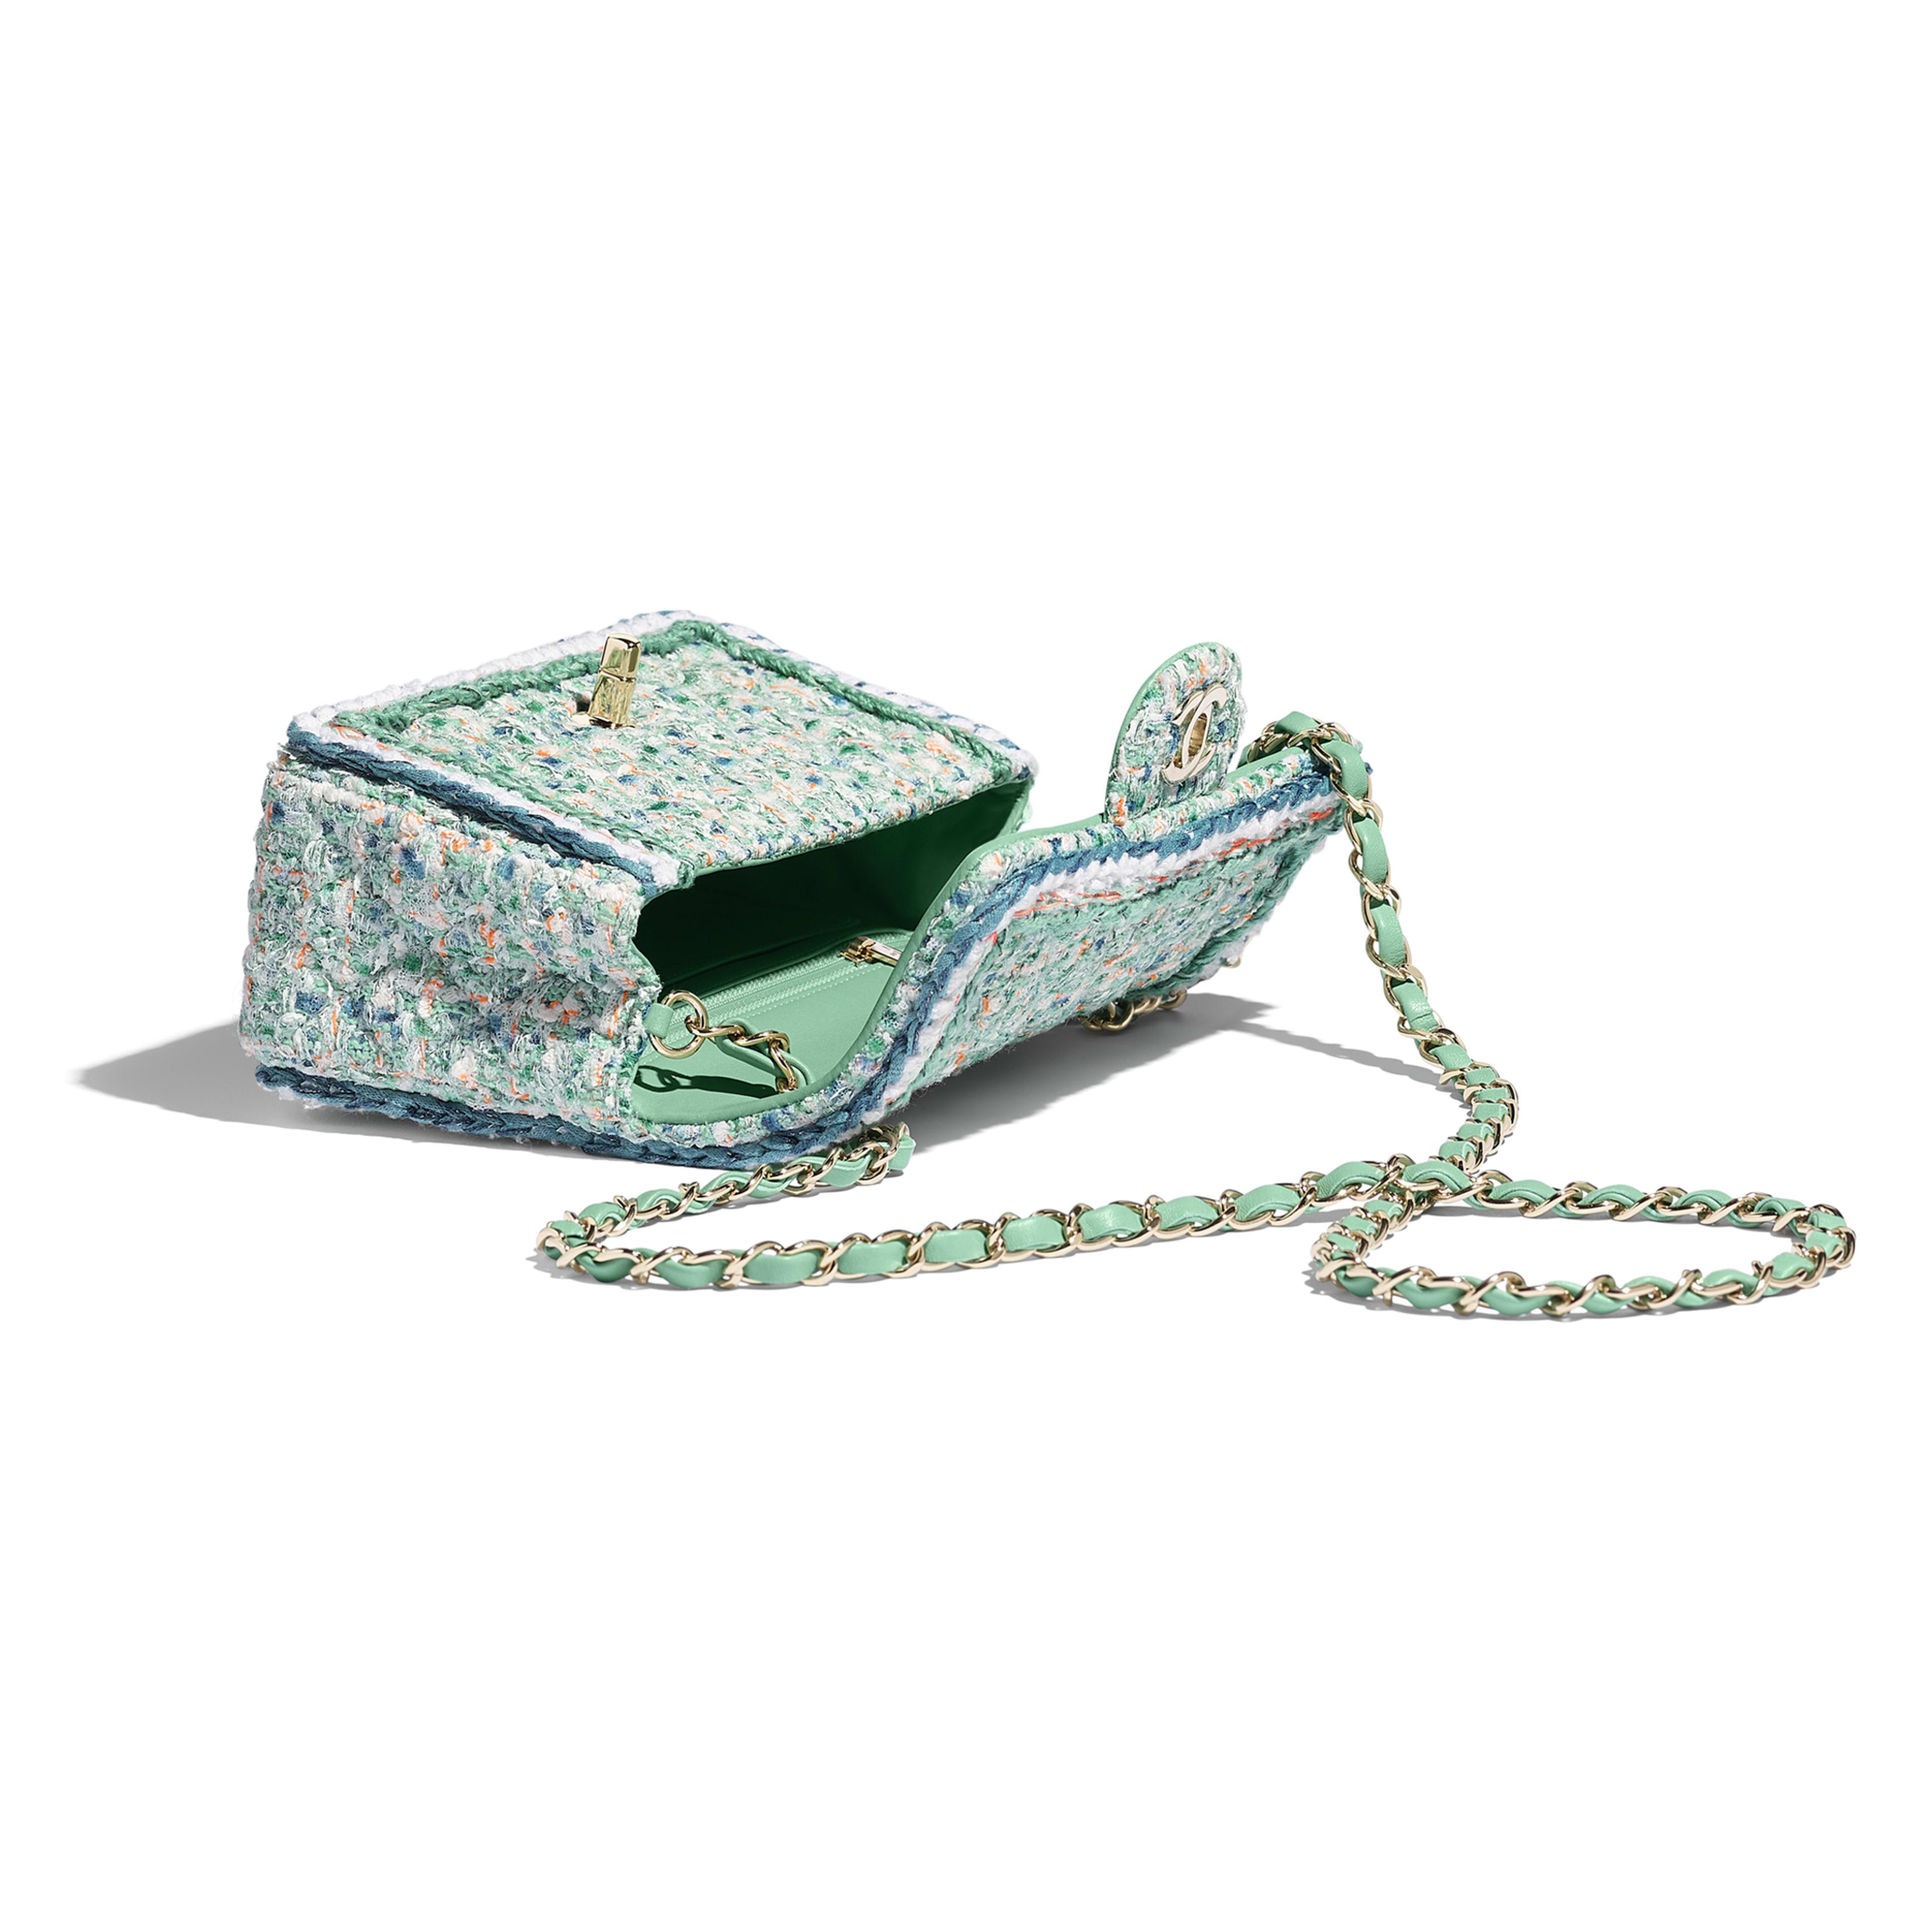 Mini Flap Bag - Green, White, Blue & Orange - Tweed & Gold-Tone Metal - Other view - see full sized version